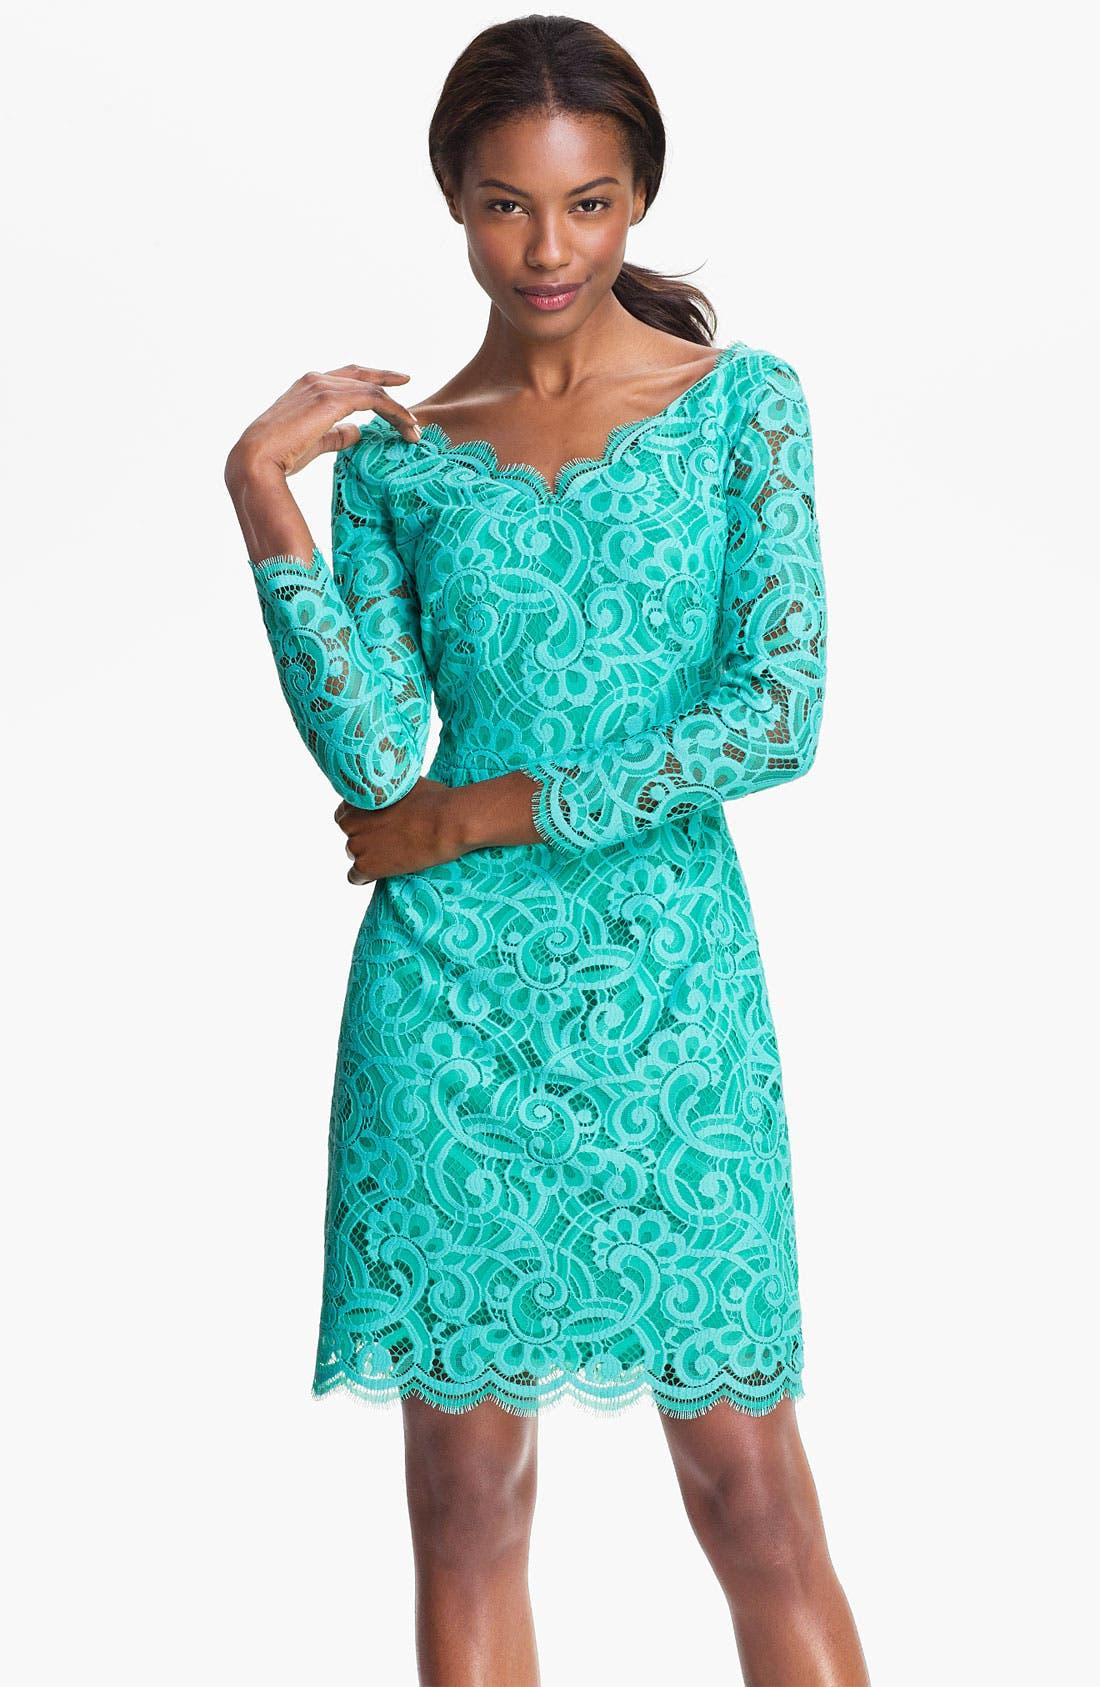 Alternate Image 1 Selected - Lilly Pulitzer® 'Helene' Double V-Neck Lace Dress